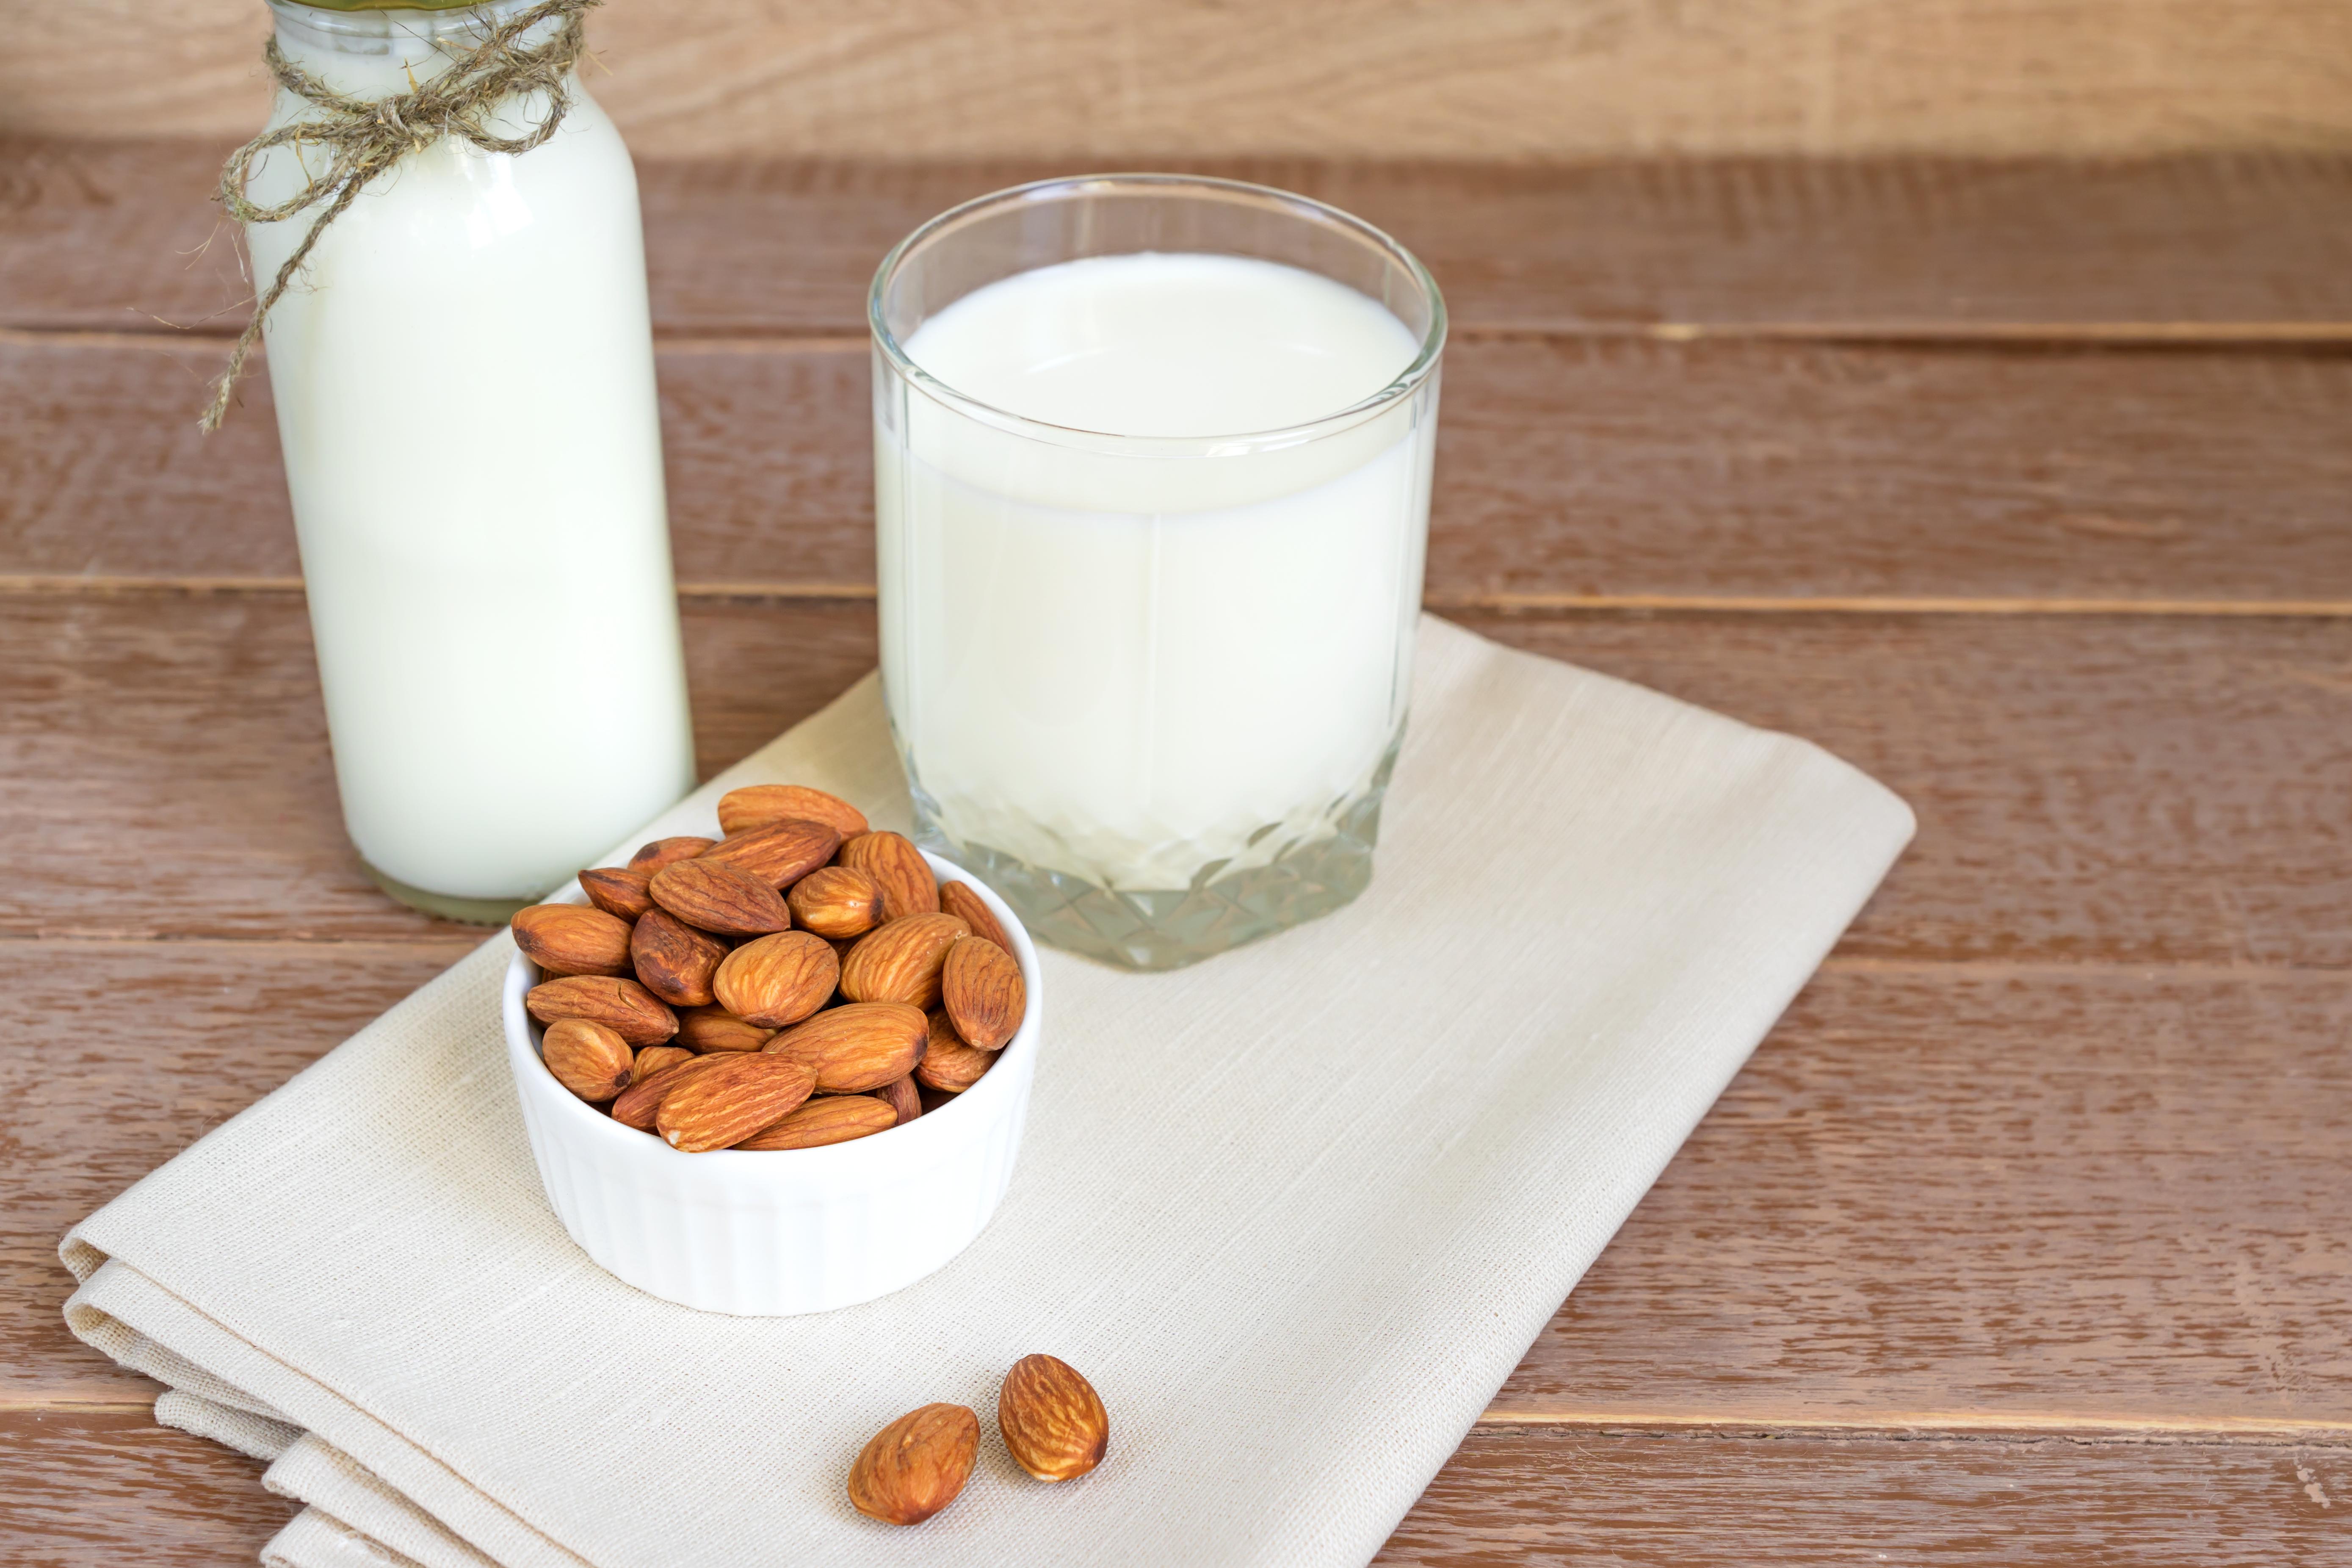 Foods That Help With Postnasal Drip | LEAFtv